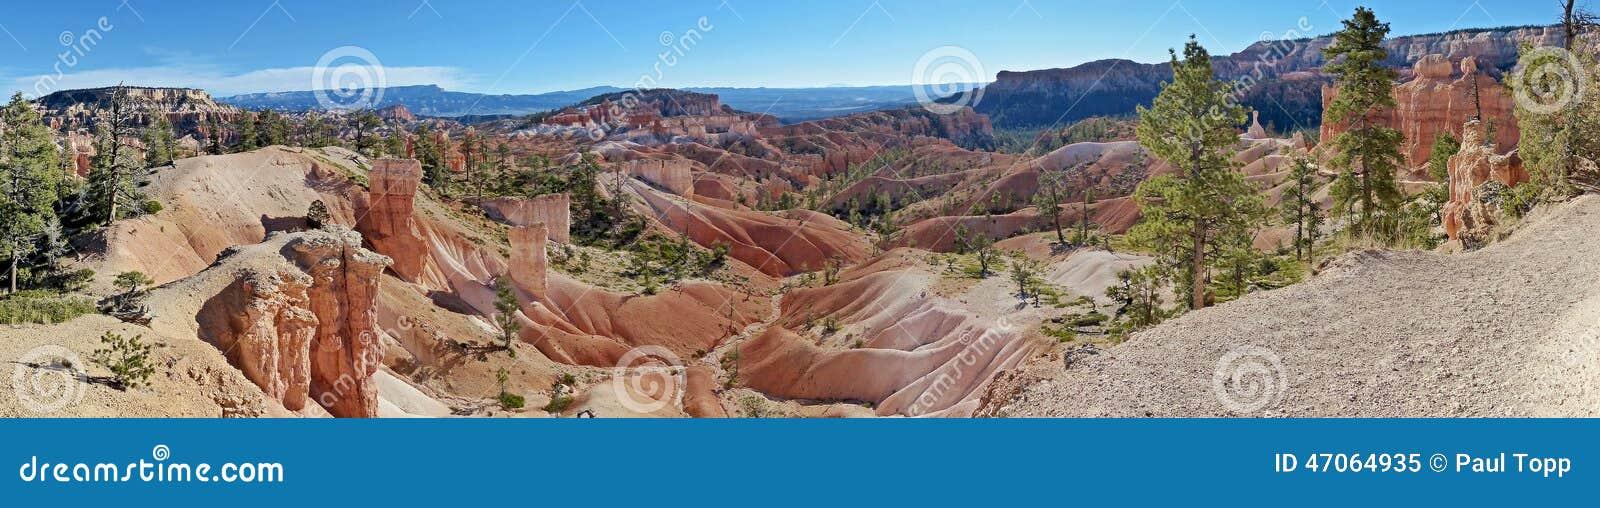 Bryce Canyon National Park Panorama